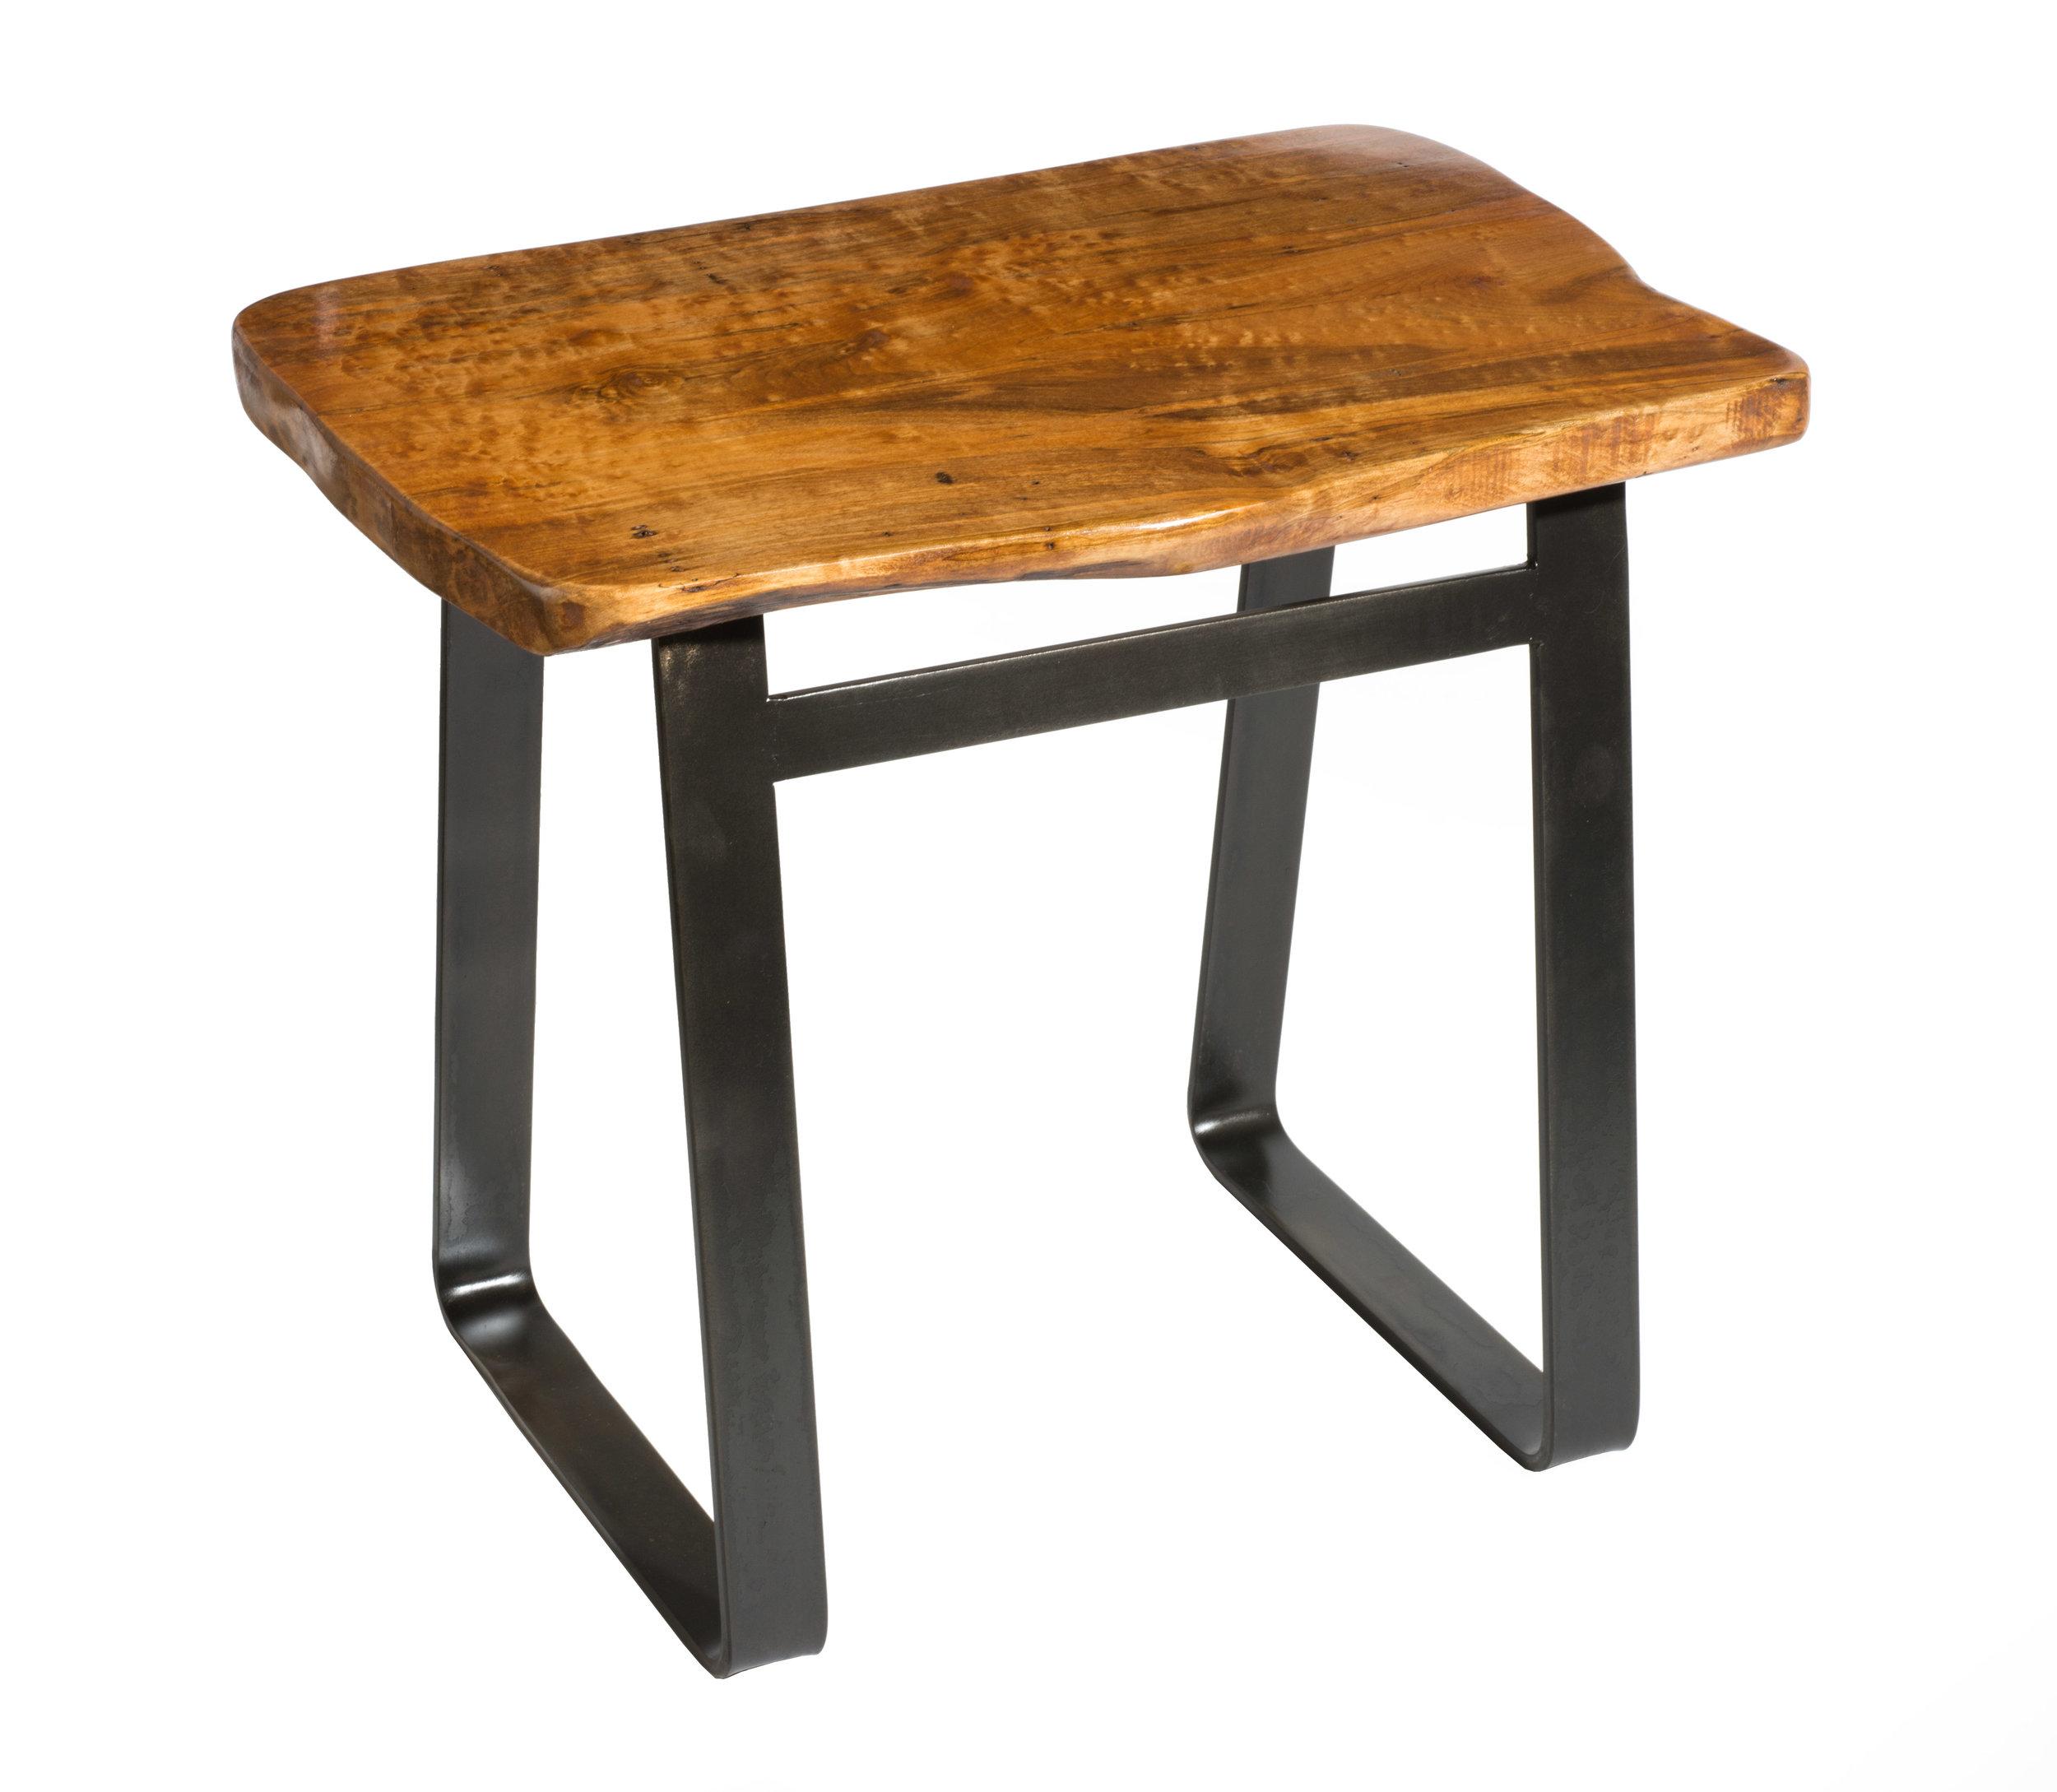 hess side table A.jpg